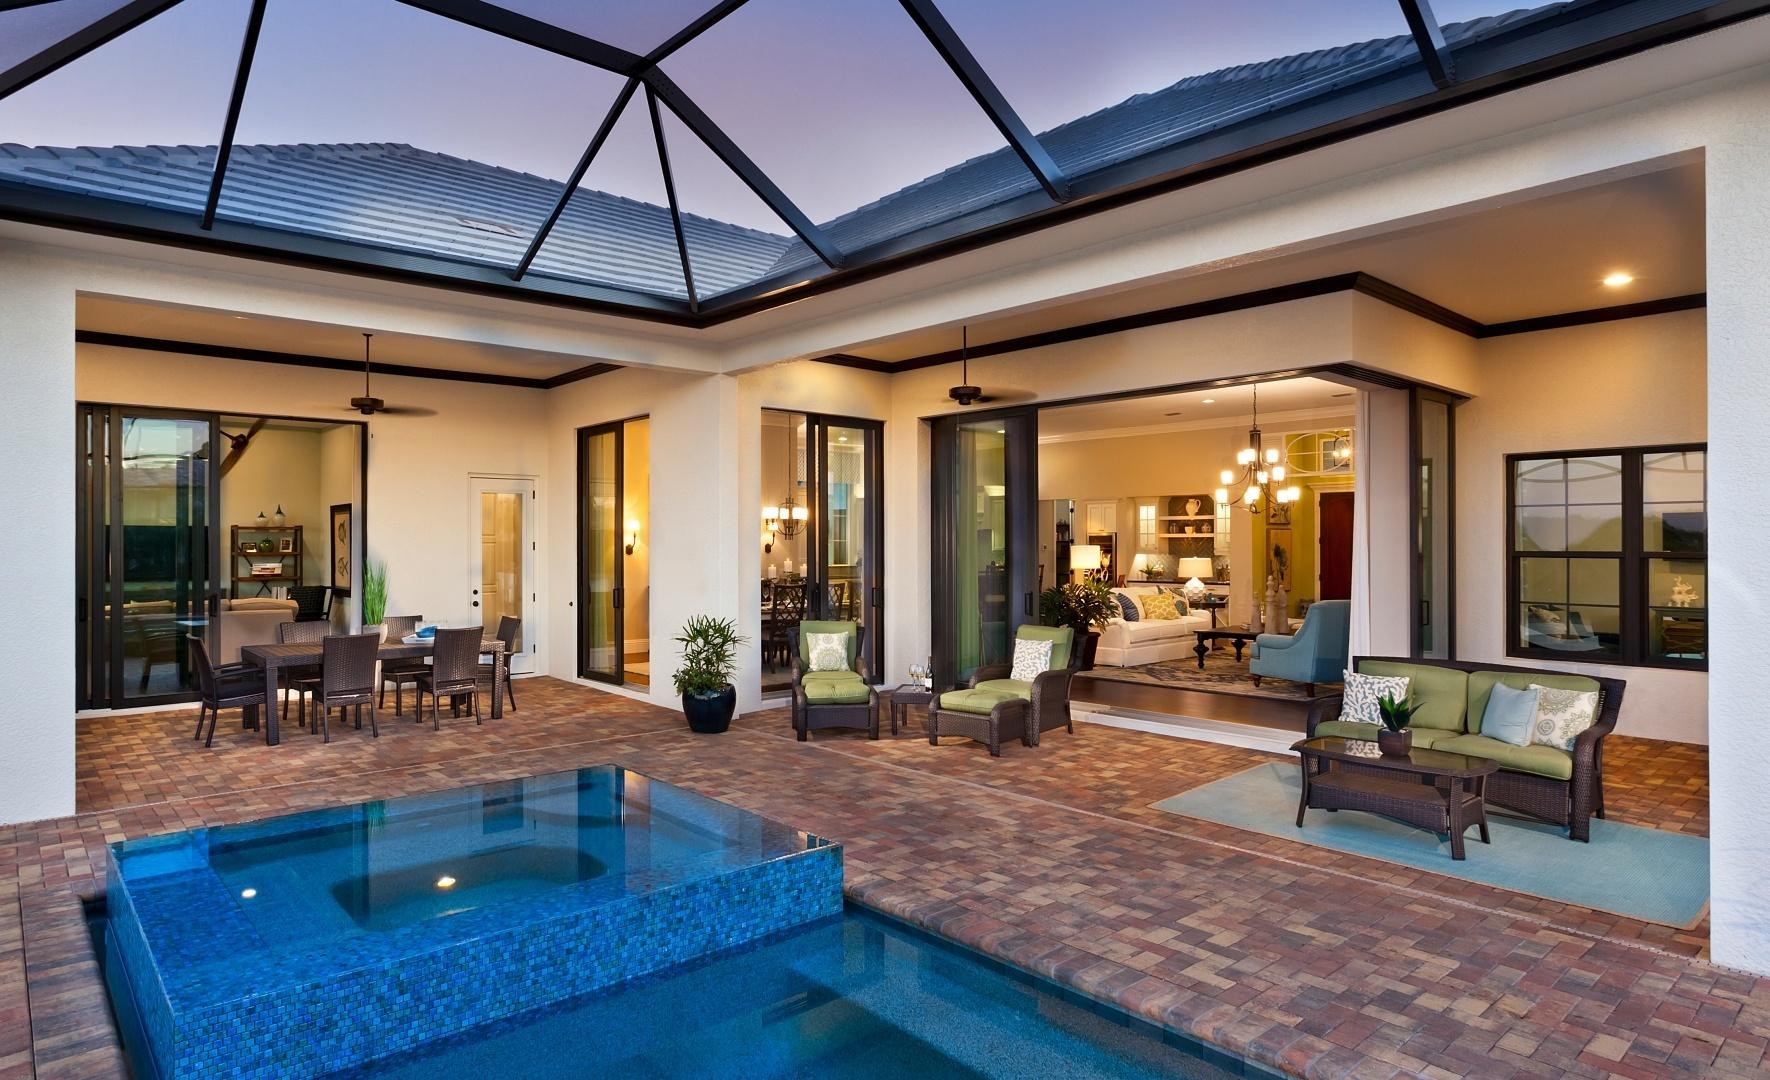 Corindi-Pool-into-great-room (1).jpg